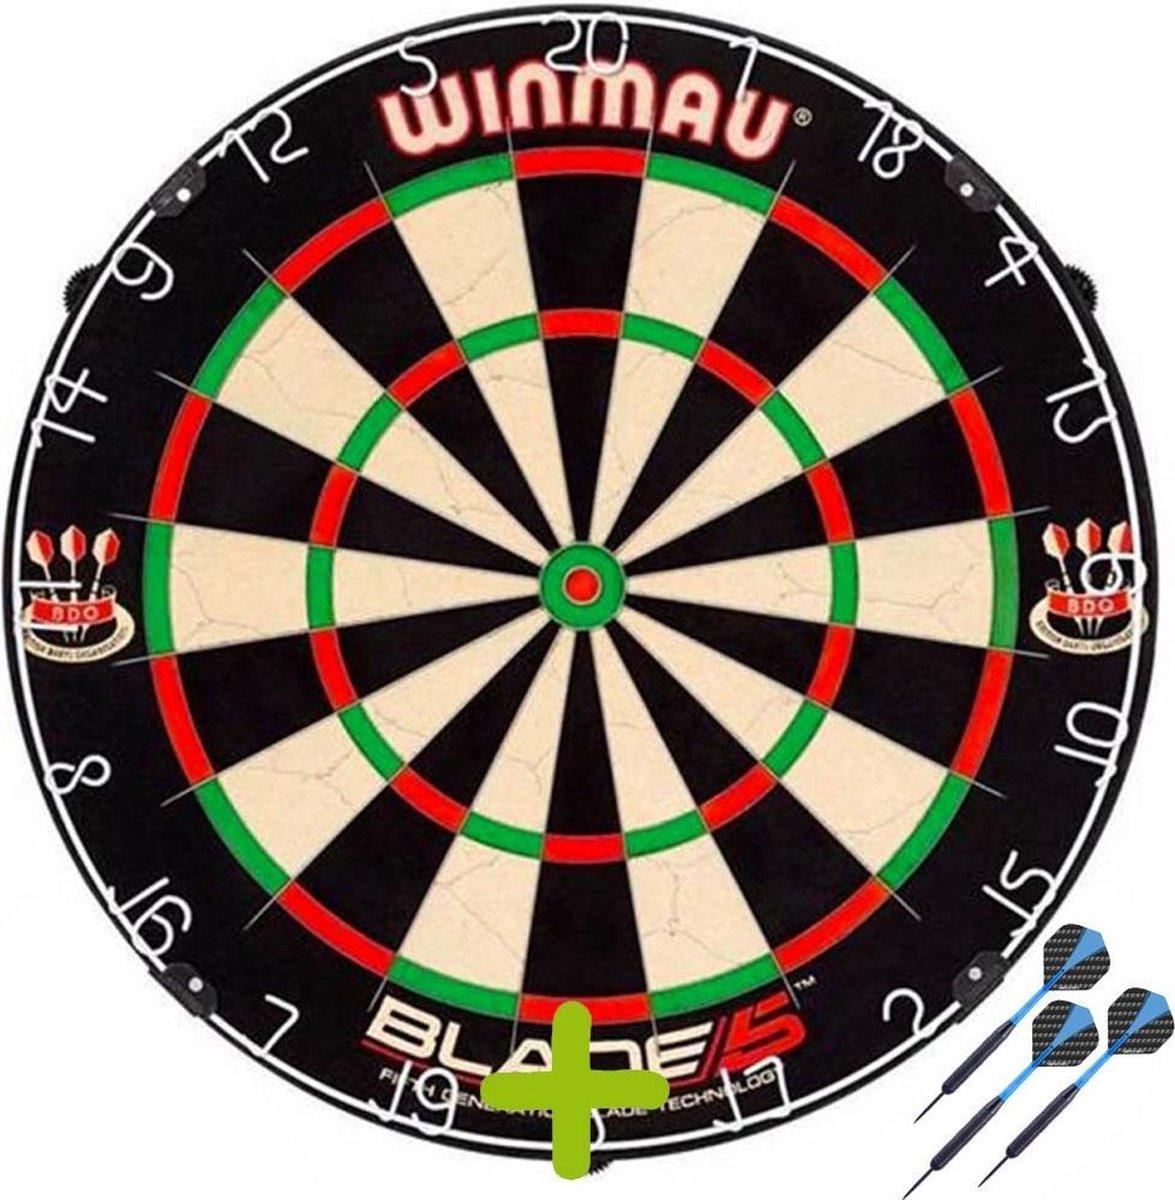 Winmau Blade 5 + 1 Set Black Brass